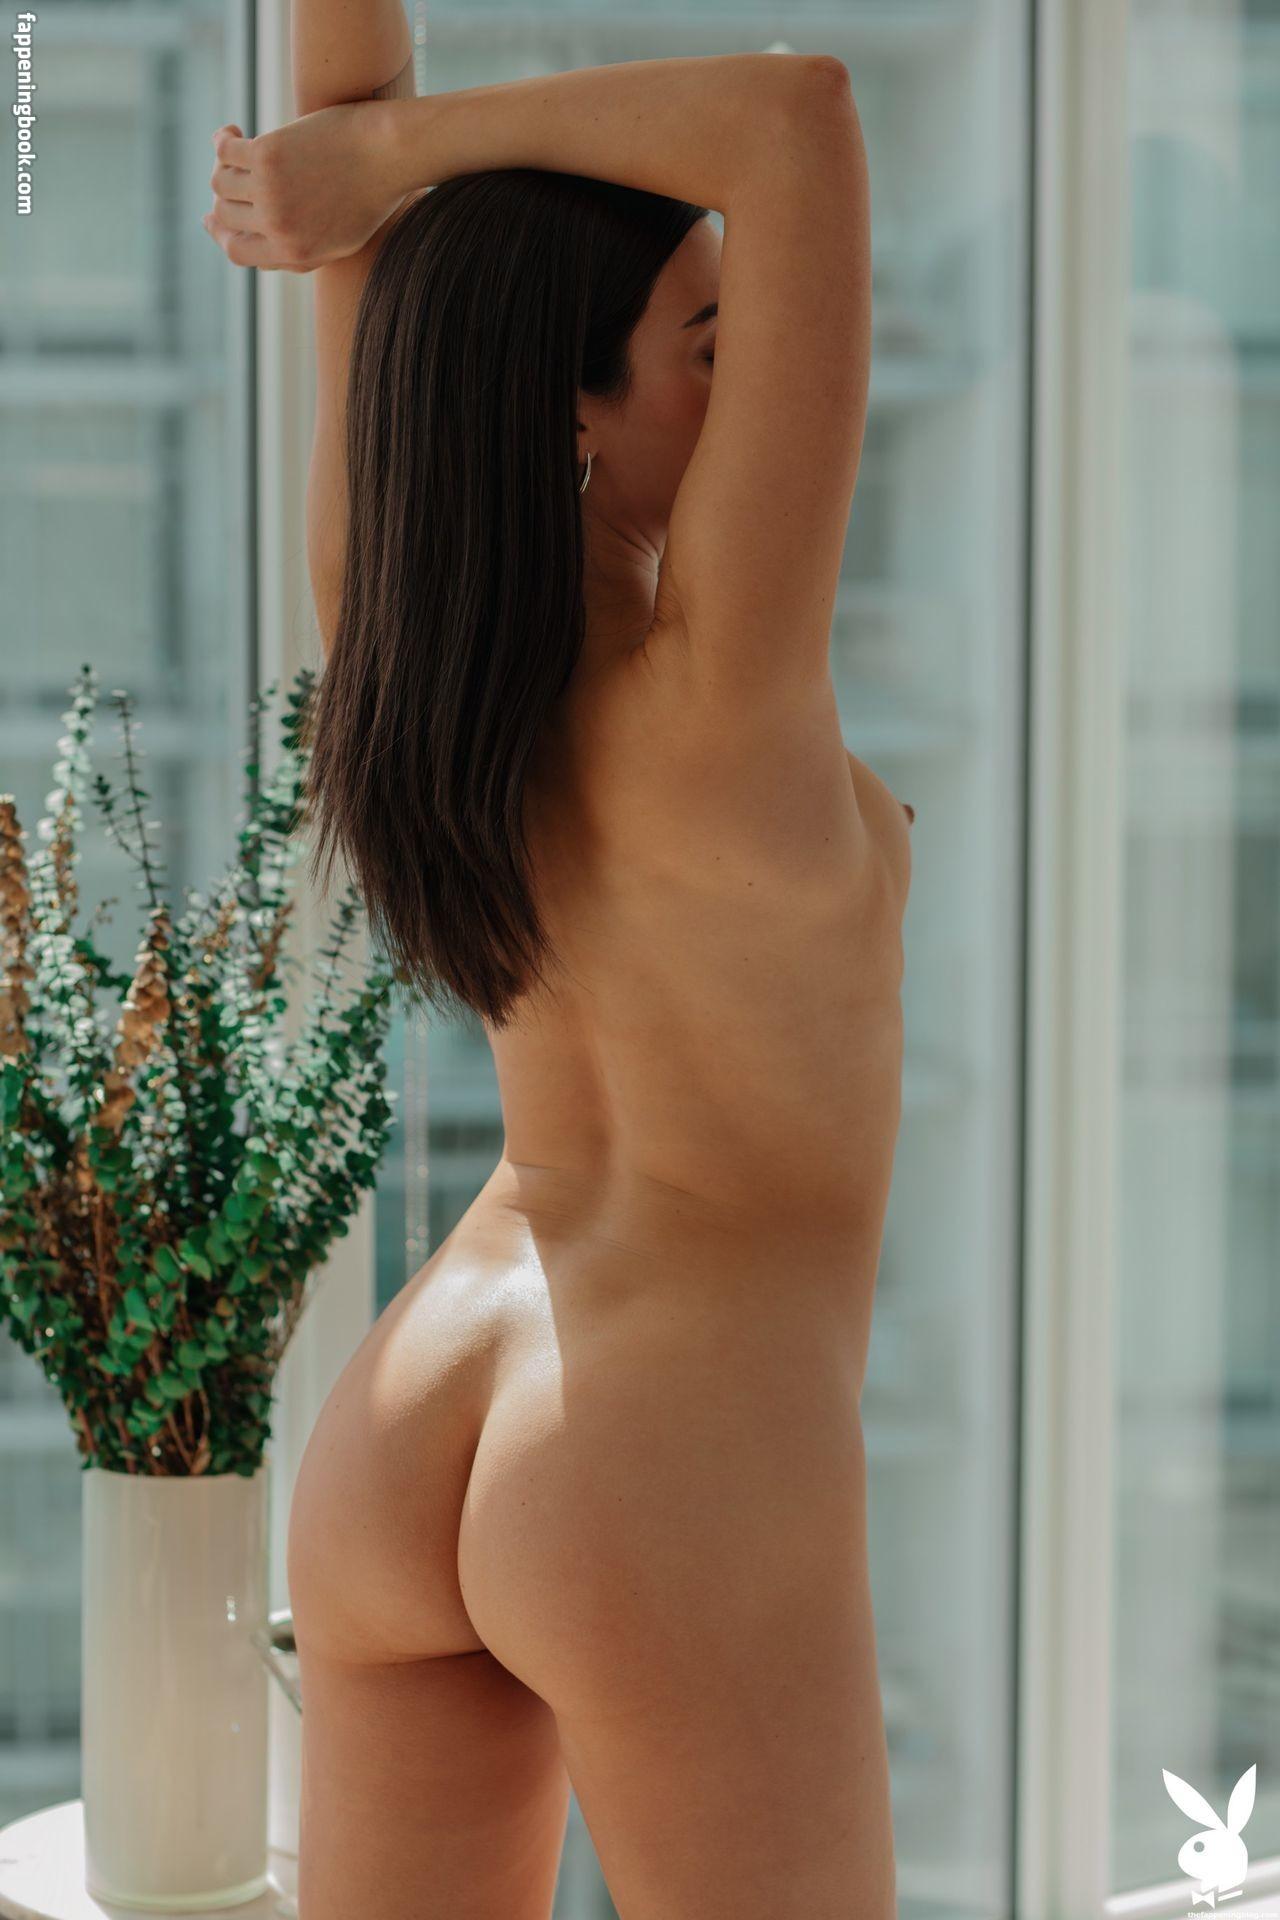 Zara Charles  nackt